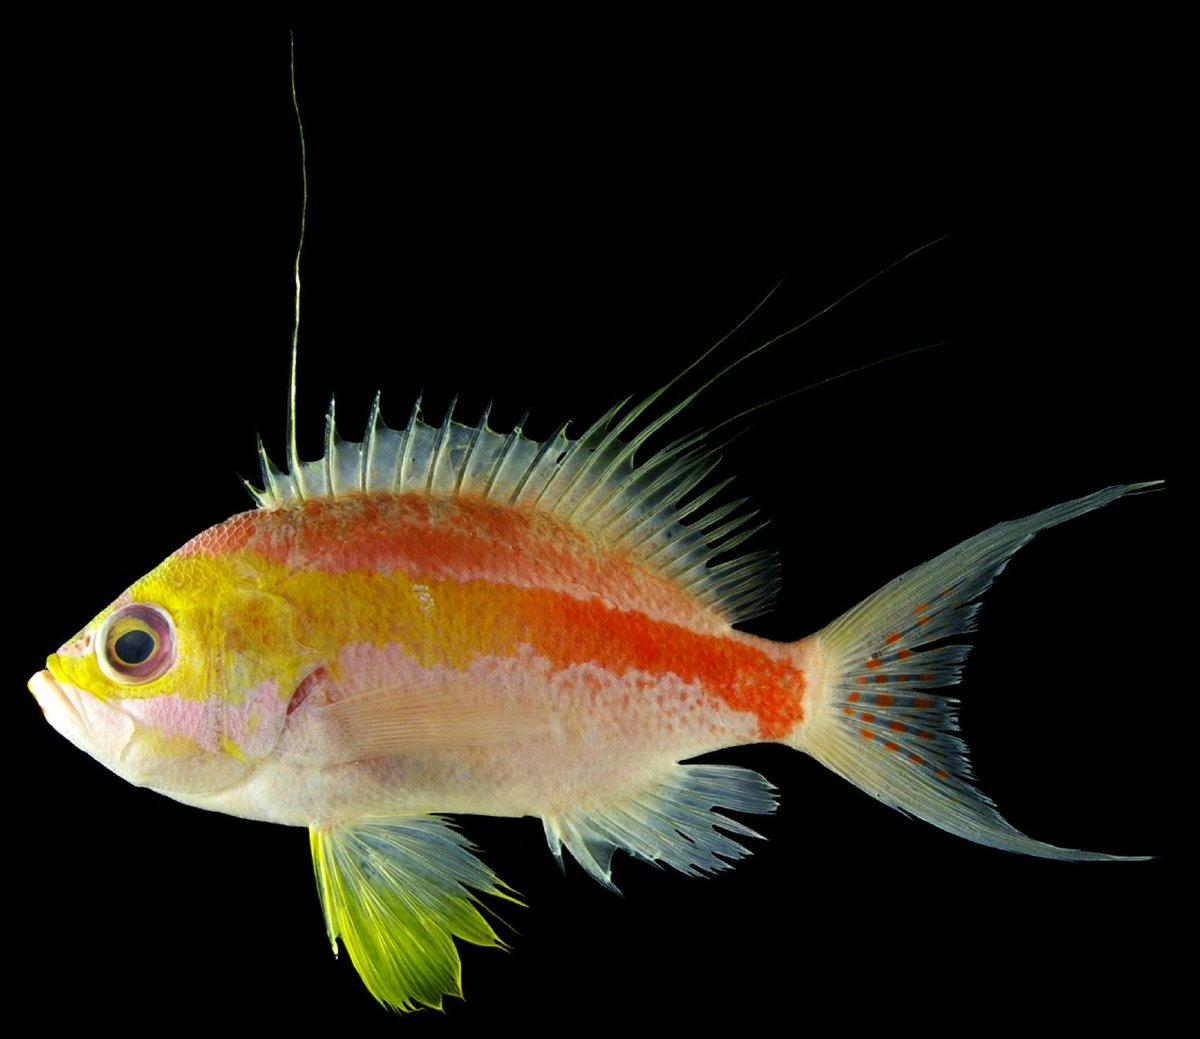 Luiz rocha on twitter stunning new species of fish discovered in luiz rocha on twitter stunning new species of fish discovered in mesophotic twilight zone andaman sea reefs httpstj3n6abxvna sciox Images